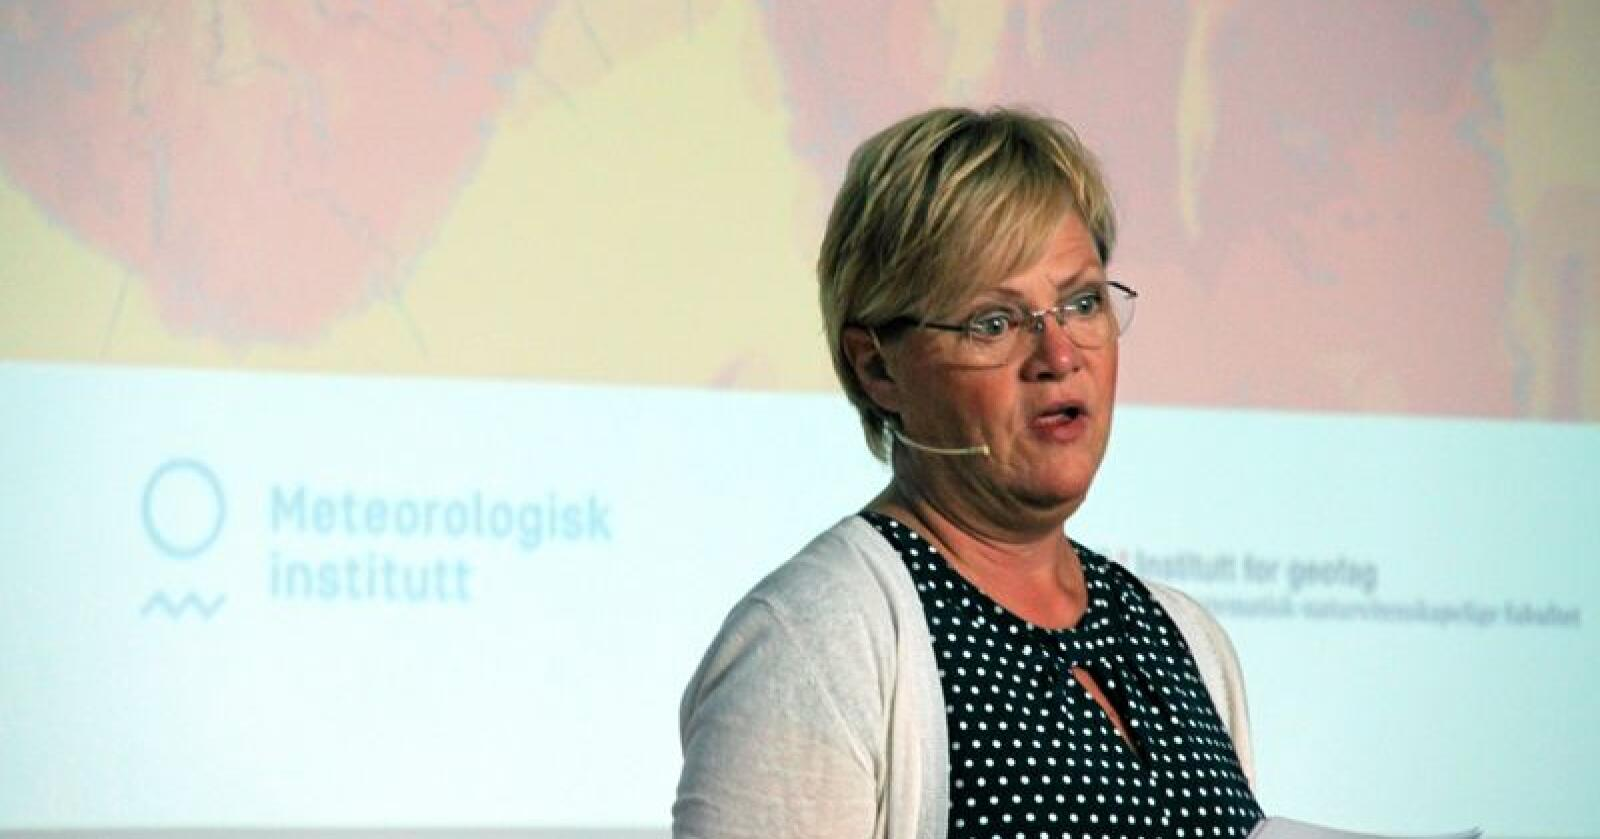 Kristin Halvorsen, direktør ved Cicero, ledet frokostseminaret Det rare været på Sentralen i Oslo torsdag. Foto: Lars Bilit Hagen